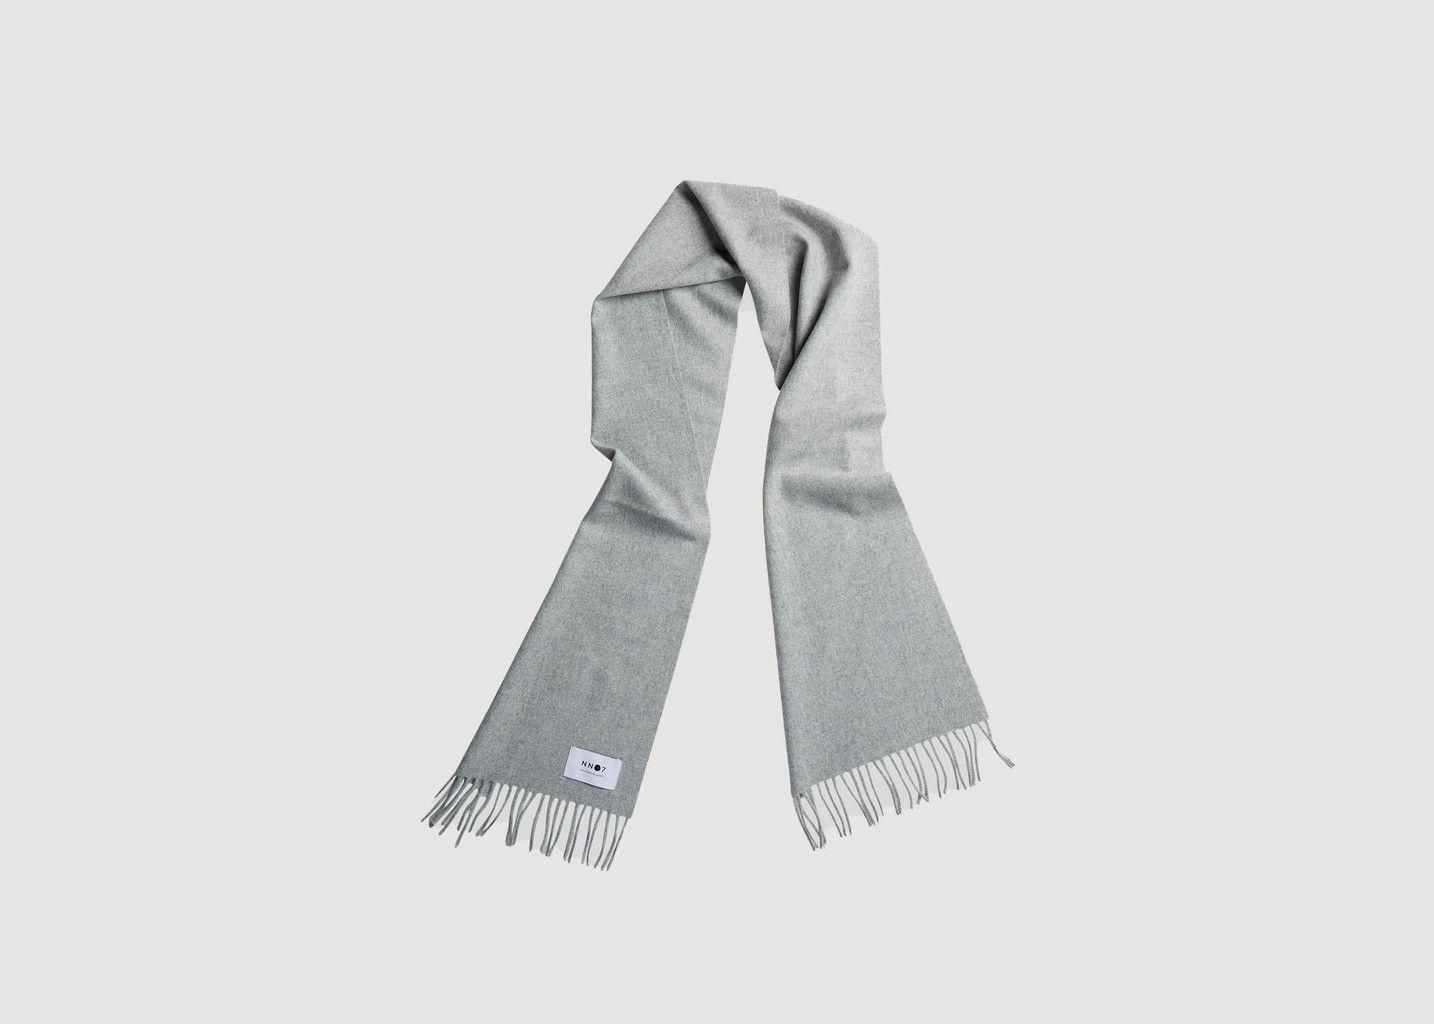 Echarpe Two en laine et cachemire  - NN07